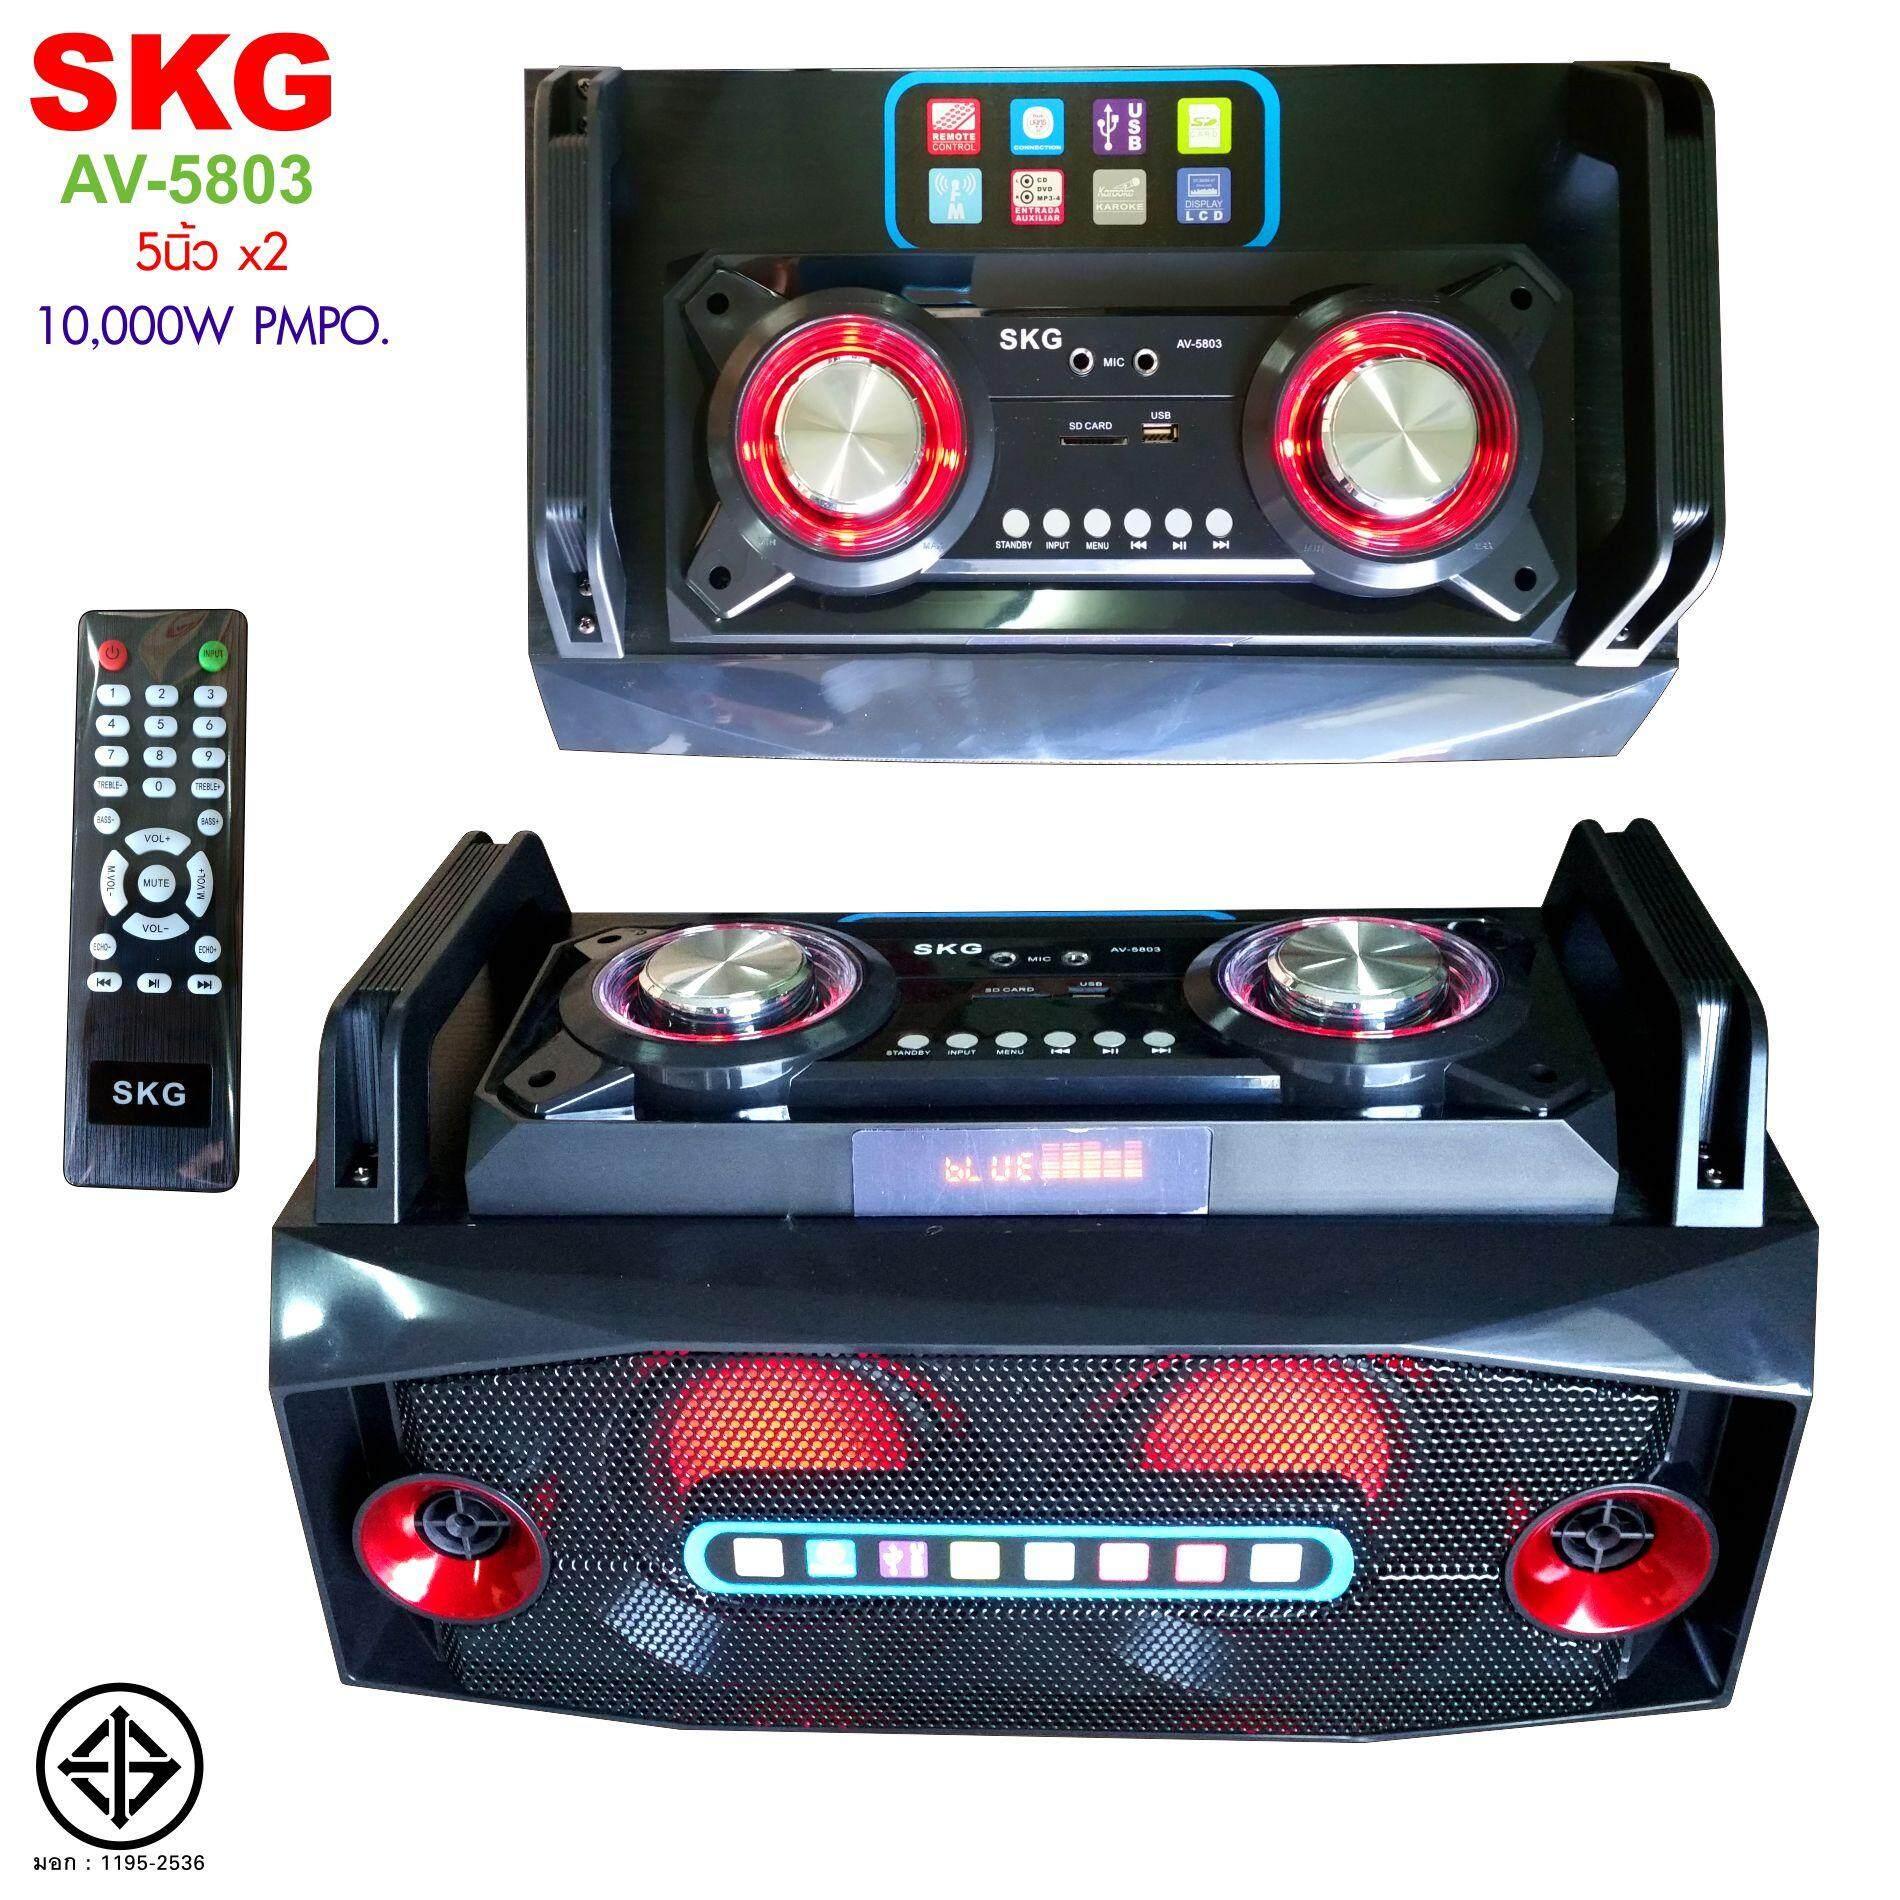 SKG ลำโพงตั้งพื้น 5 นิ้ว x2 10000 W PMPO 2.0CH รุ่น AV-5803 (สีดำ)